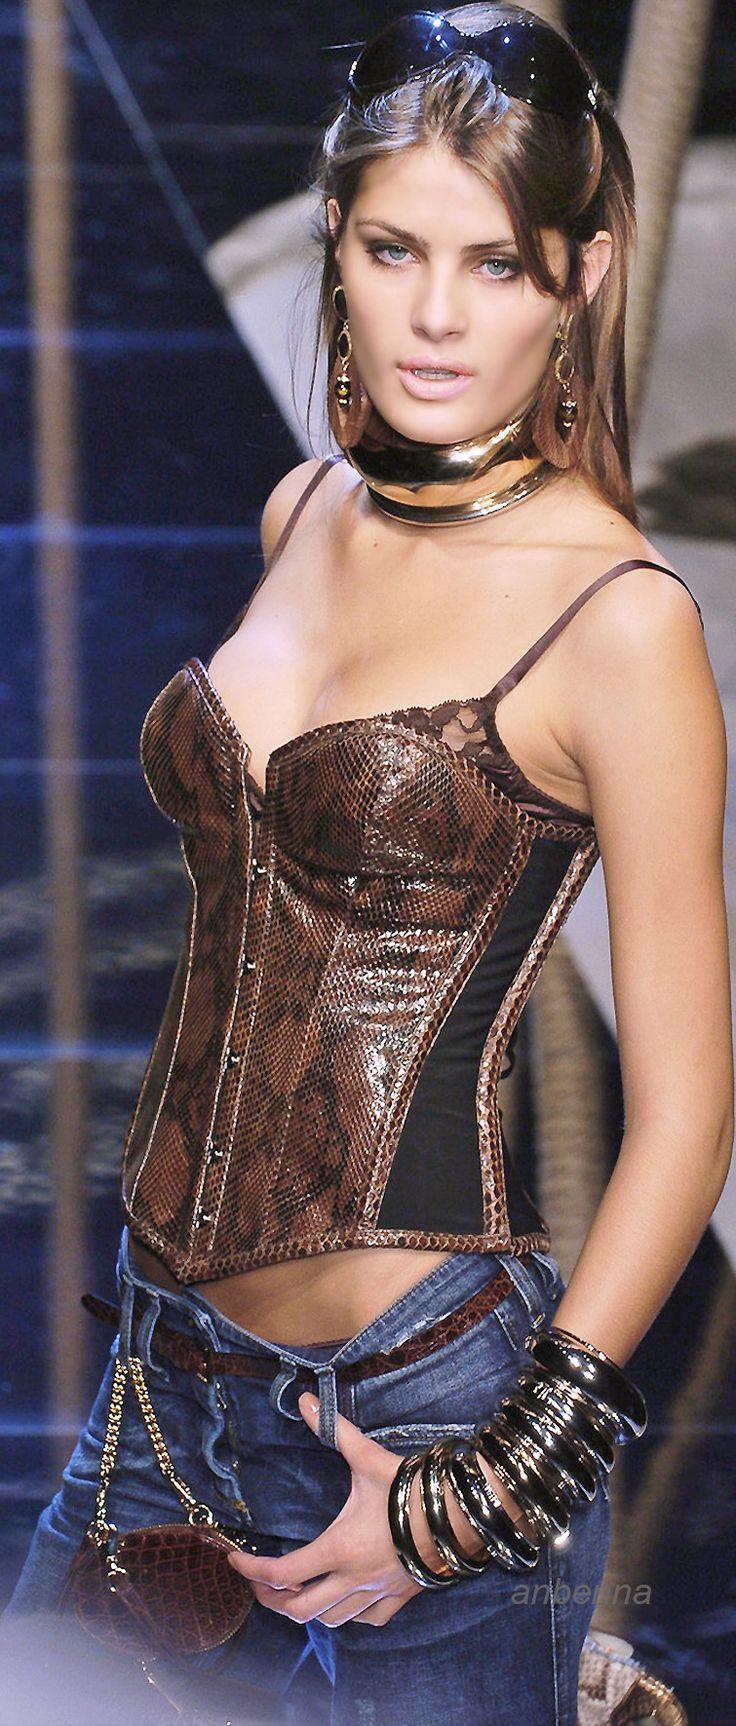 Dolce&Gabbana via anbenna snake skin corset bustier Animalistic Fashion Inspiration Style #UNIQUE_WOMENS_FASHION